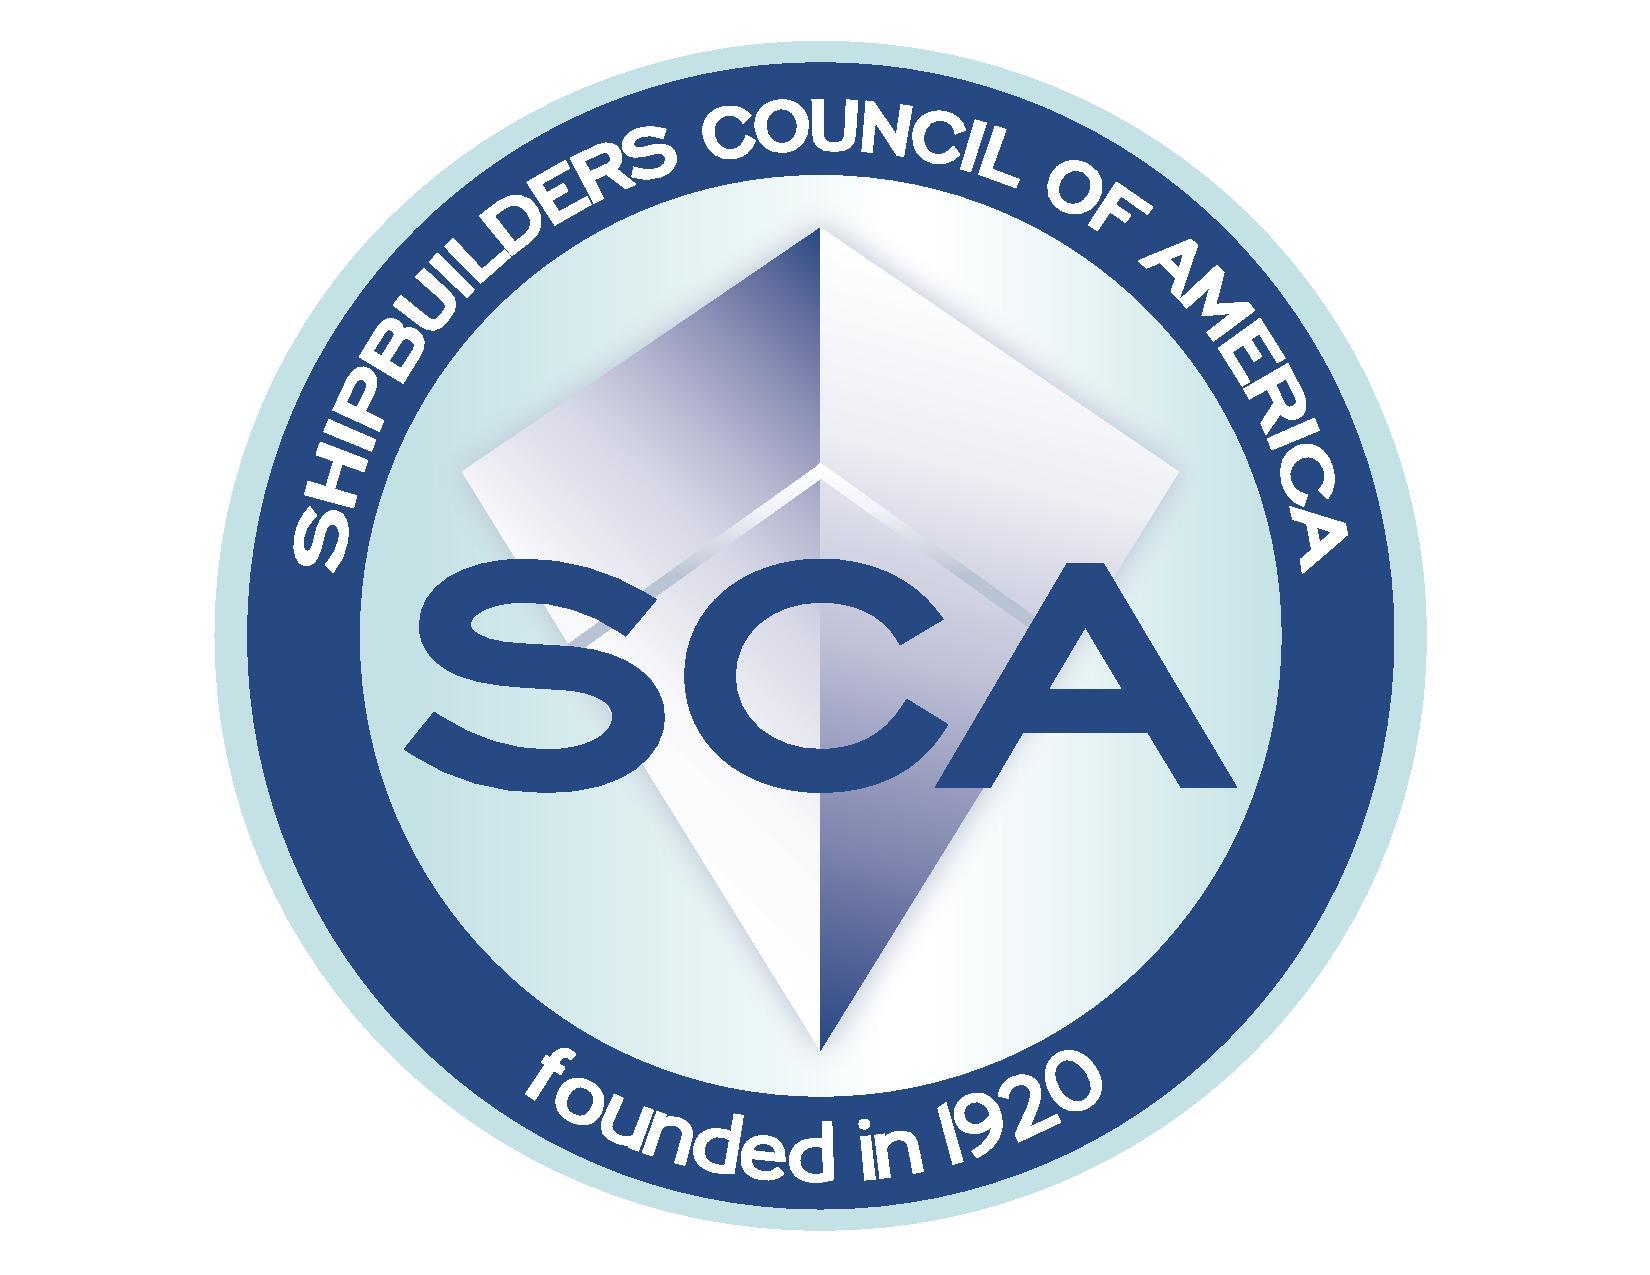 AUSTAL USA EARNS 10TH PRESTIGIOUS SCA SAFETY AWARD